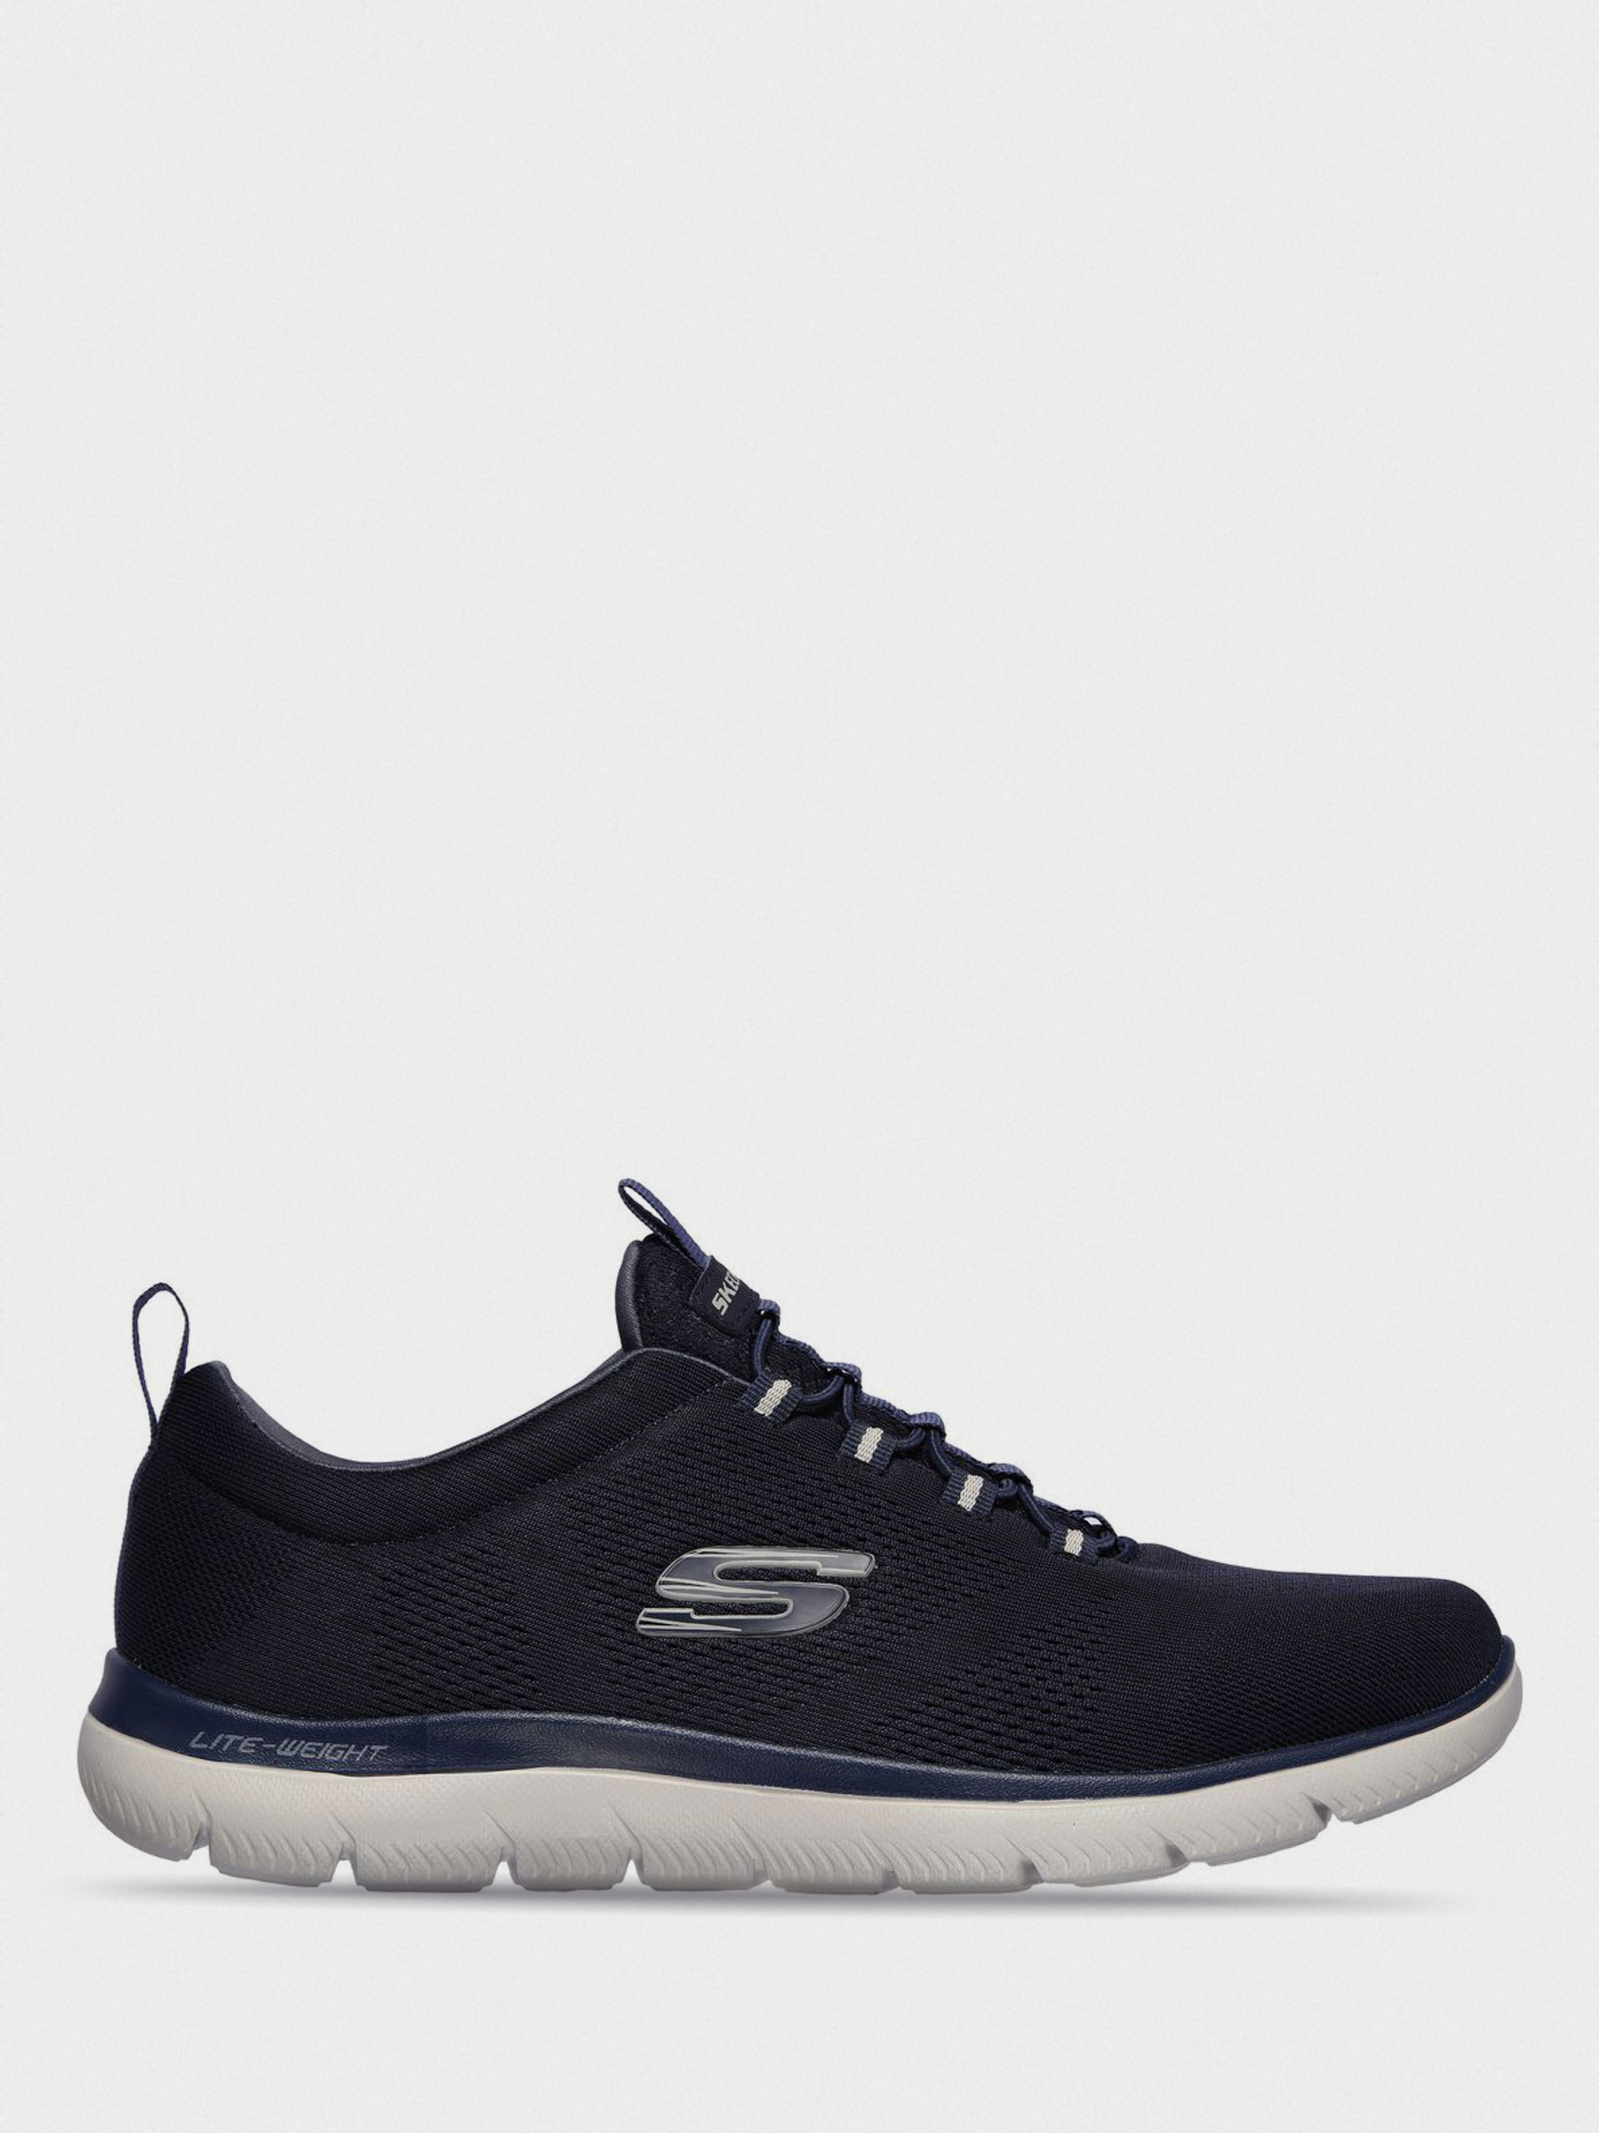 Кросівки чоловічі Skechers 232186 NVY 232186 NVY - фото